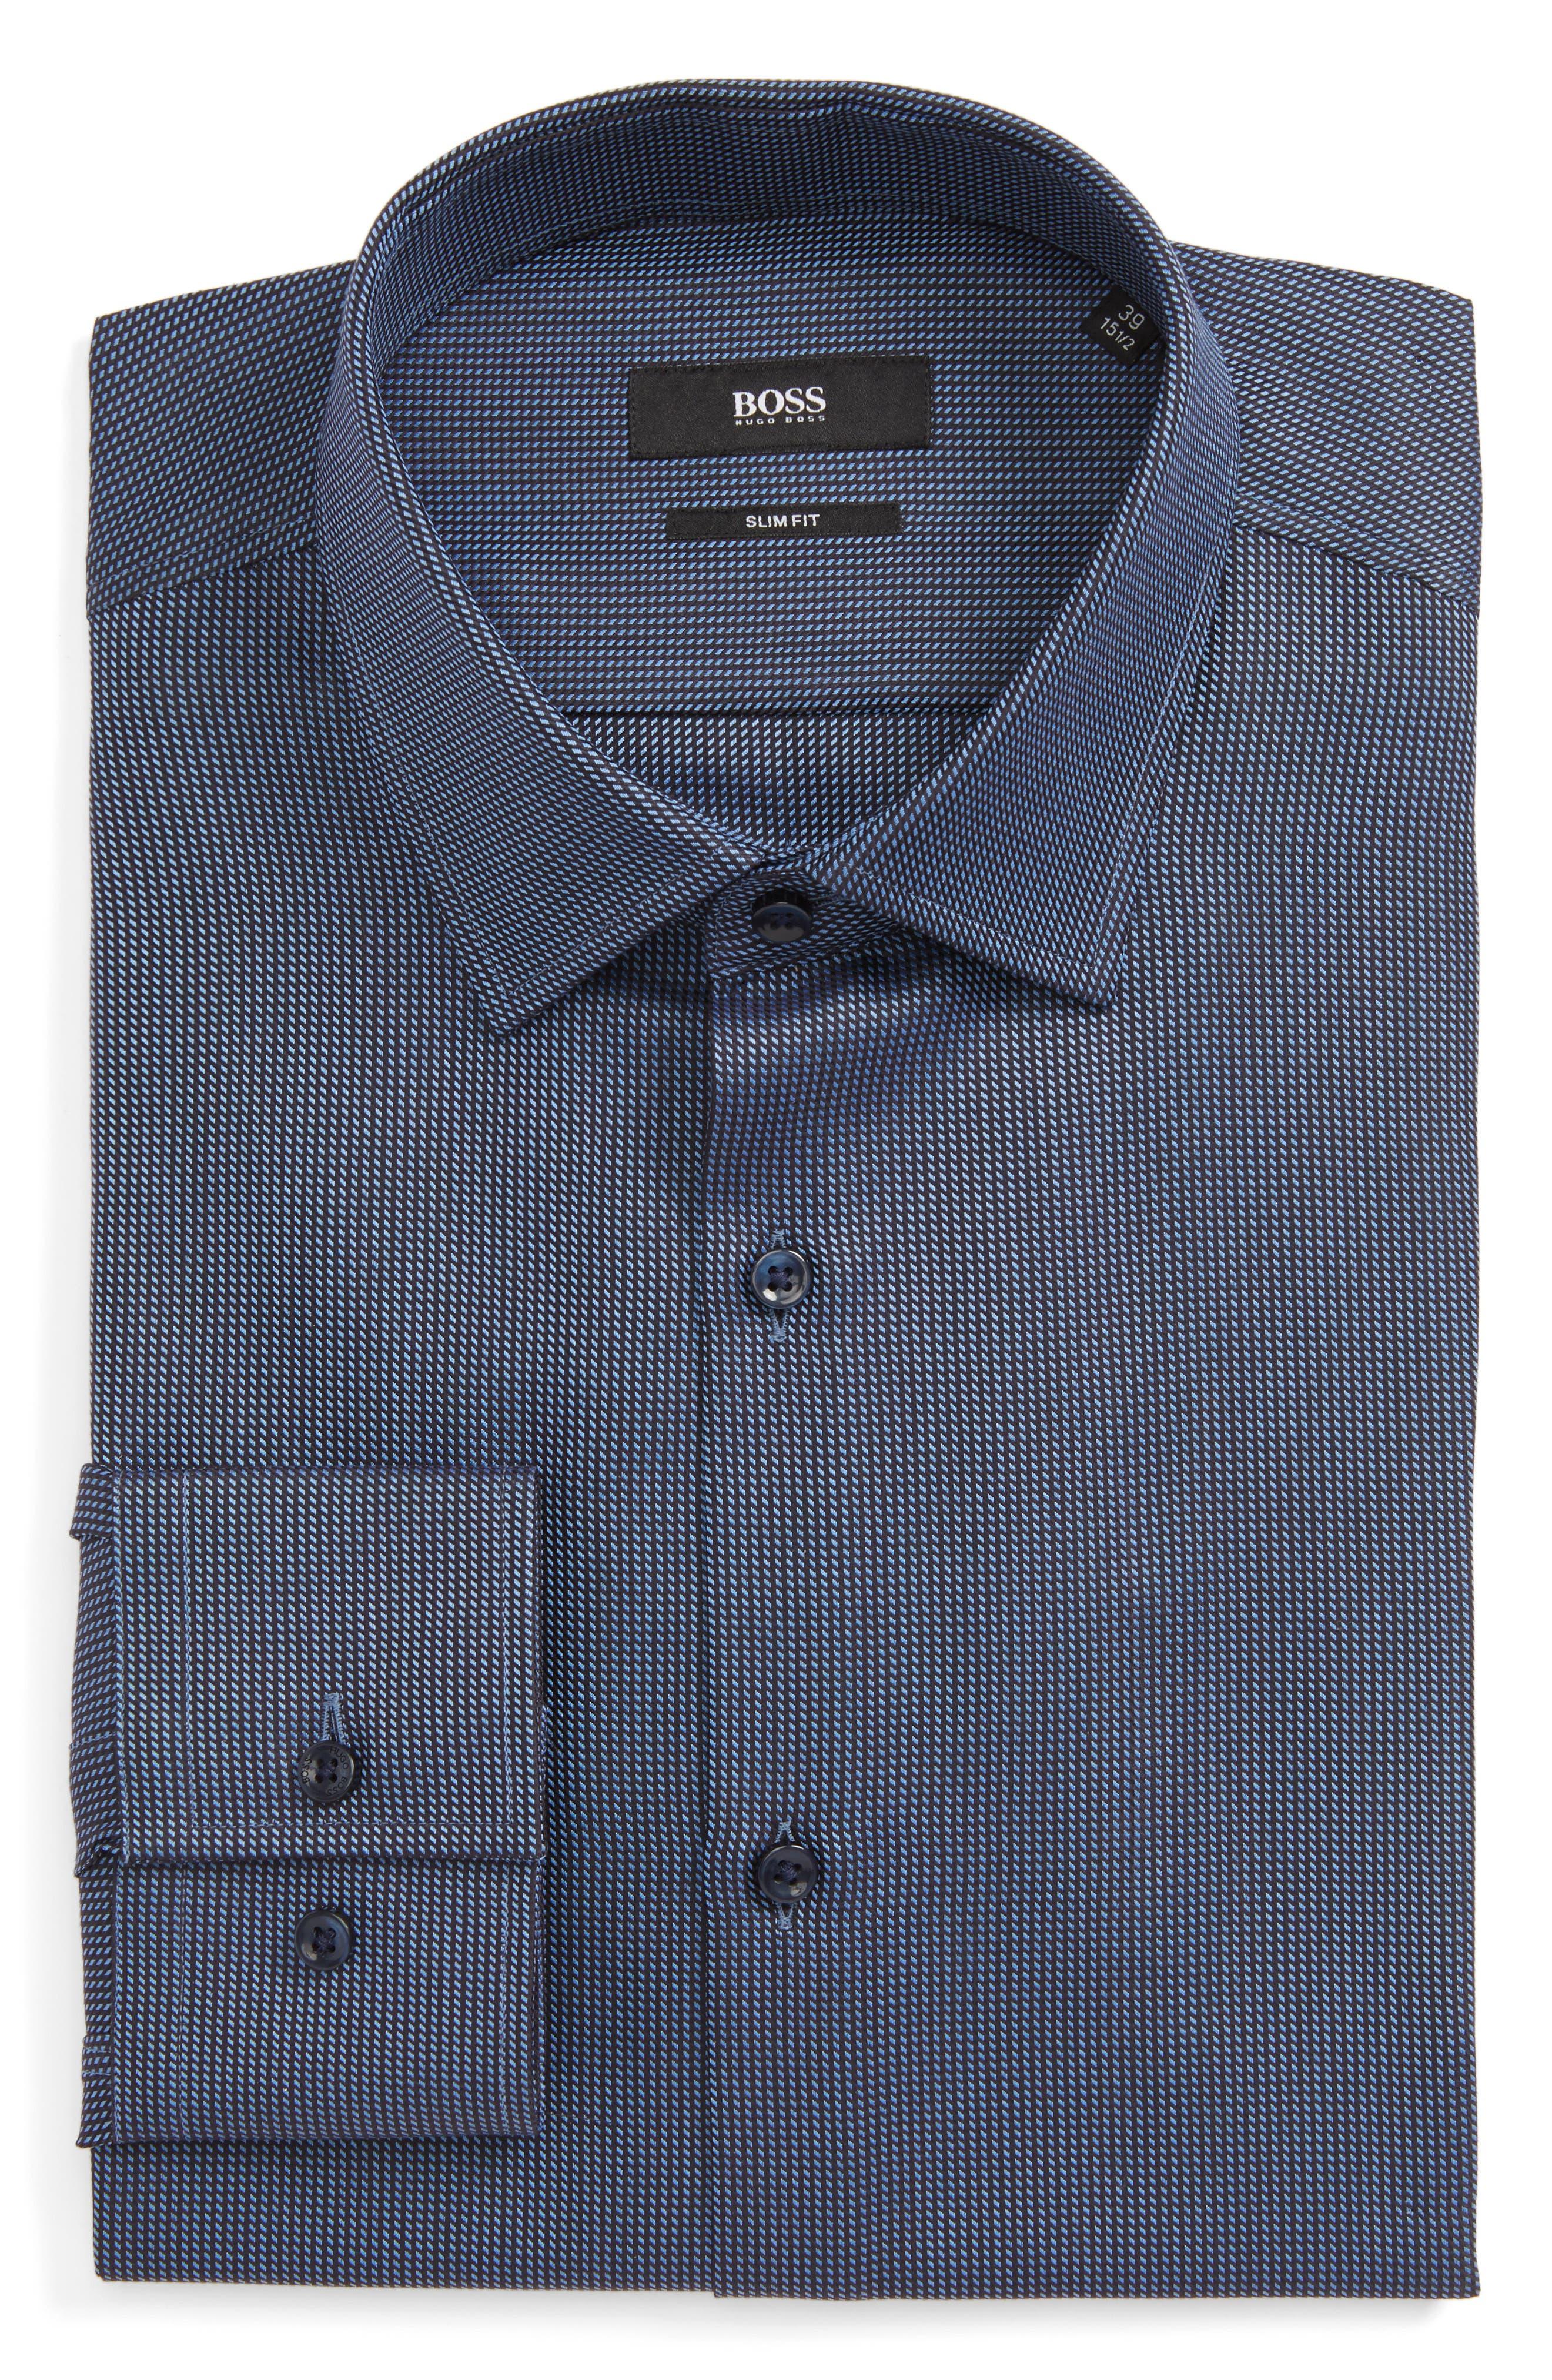 Jenno Slim Fit Dress Shirt,                         Main,                         color, 410